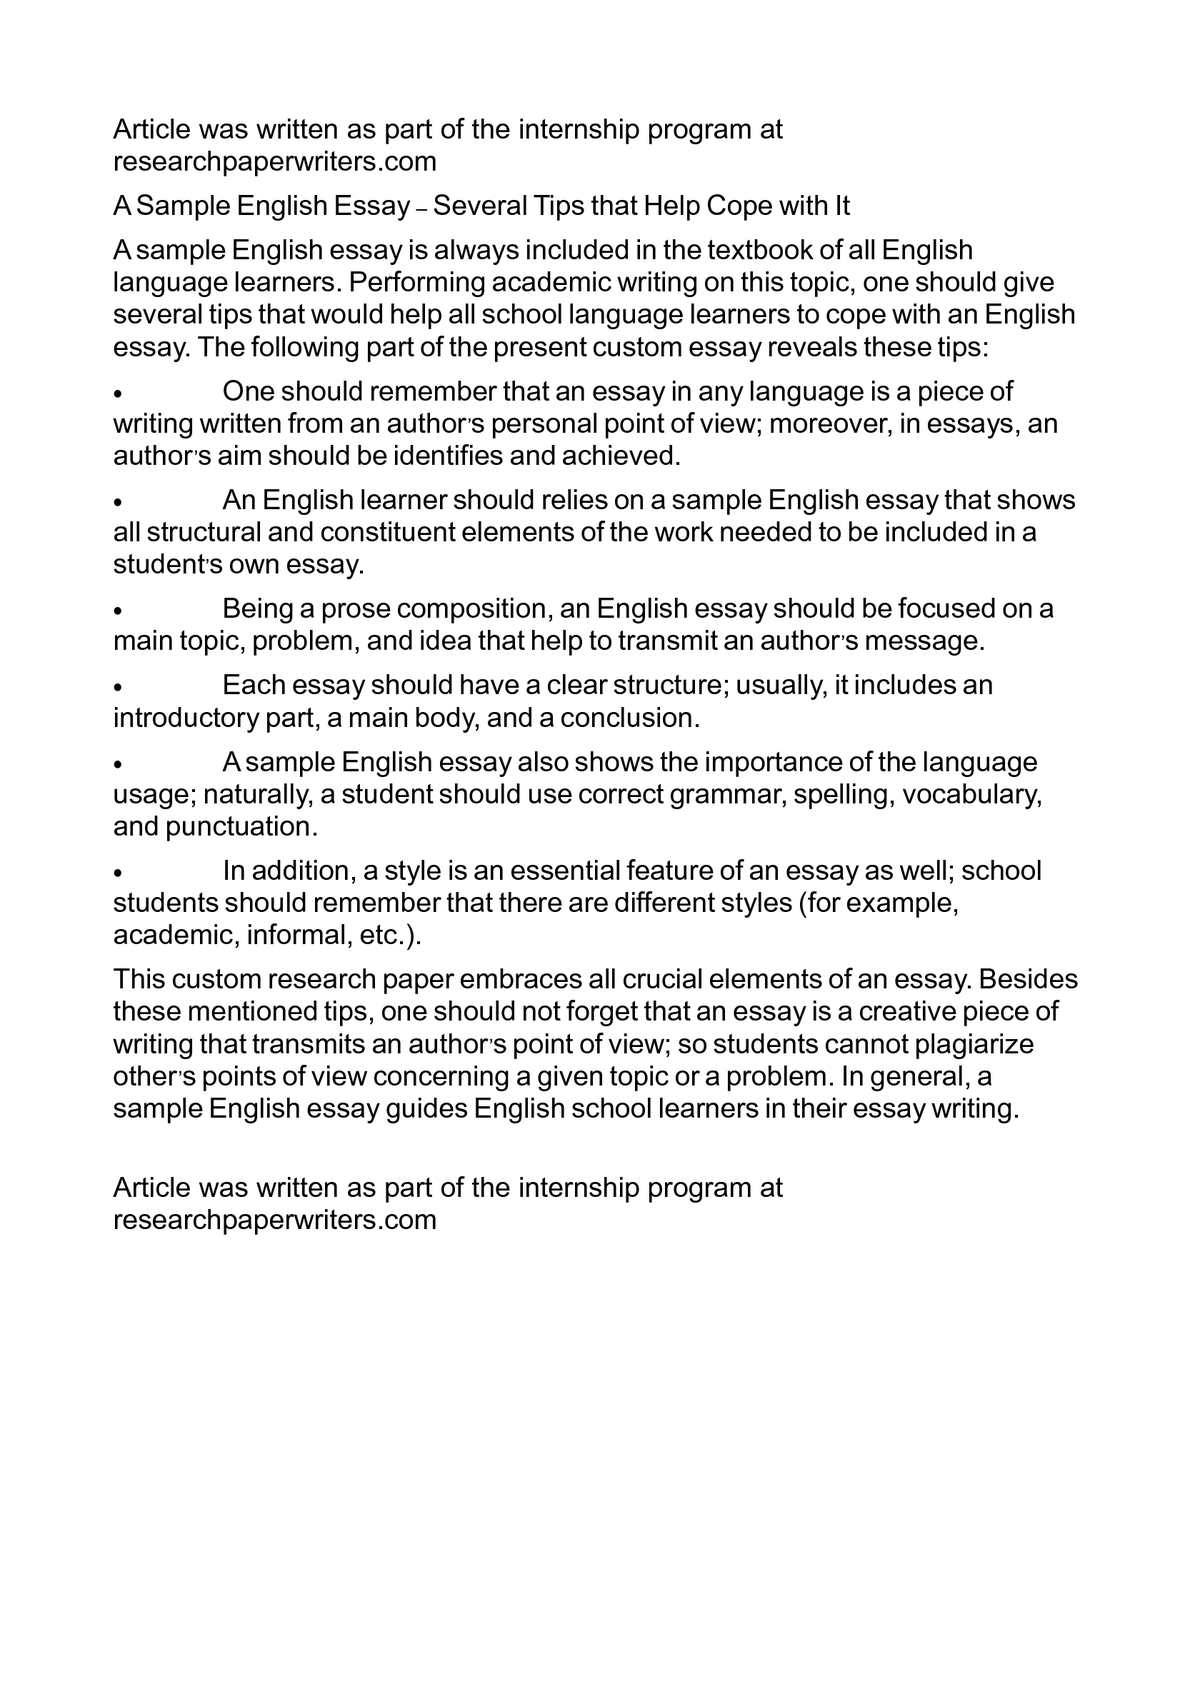 Calamo  A Sample English Essay  Several Tips That Help Cope With It A Sample English Essay  Several Tips That Help Cope With It